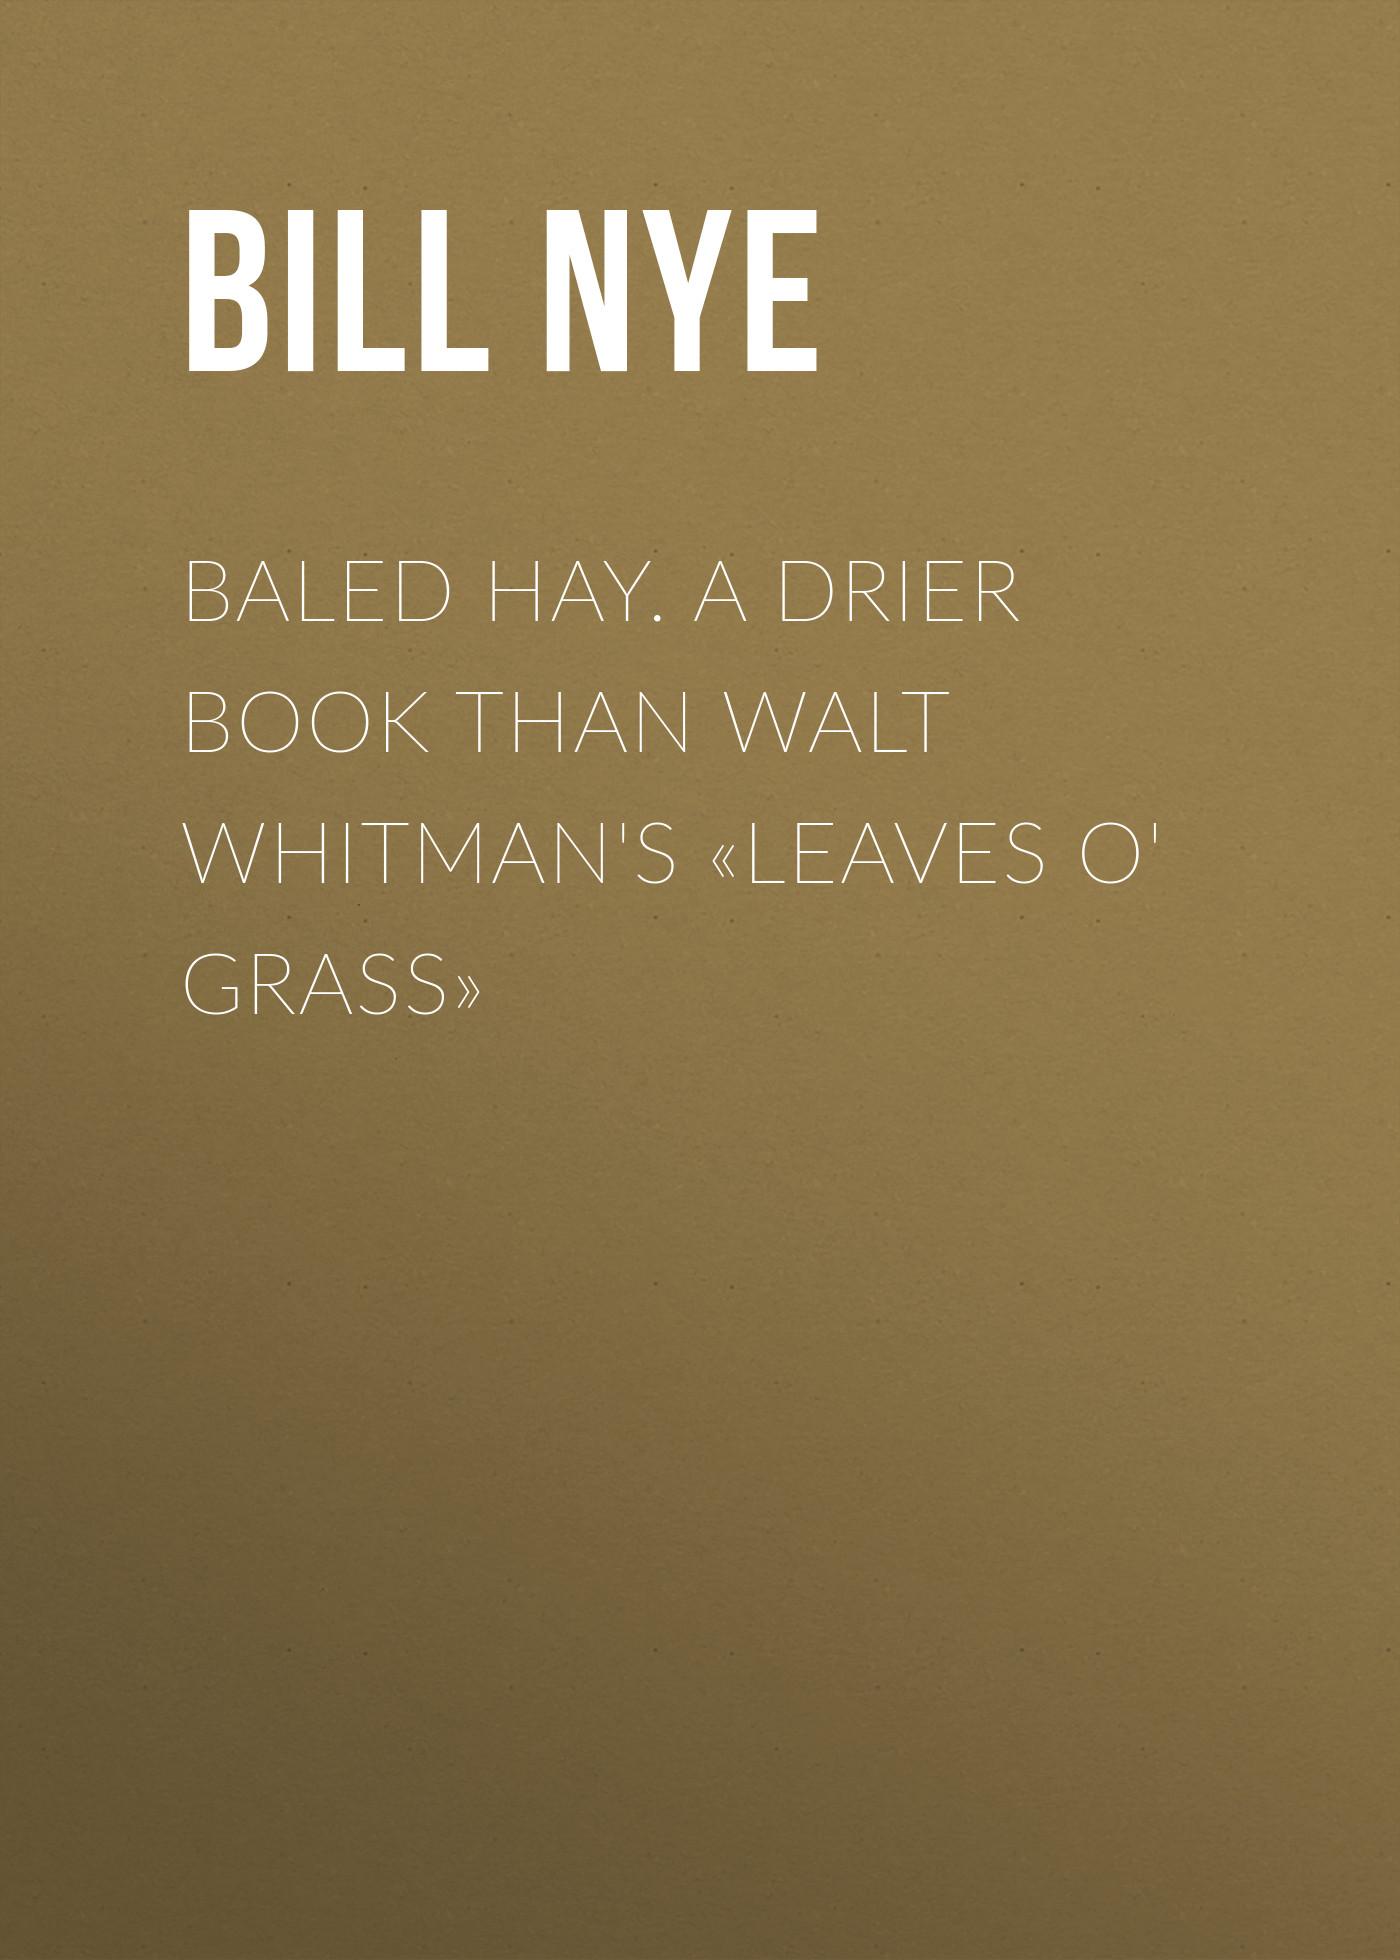 Baled Hay. A Drier Book than Walt Whitman's«Leaves o'Grass»